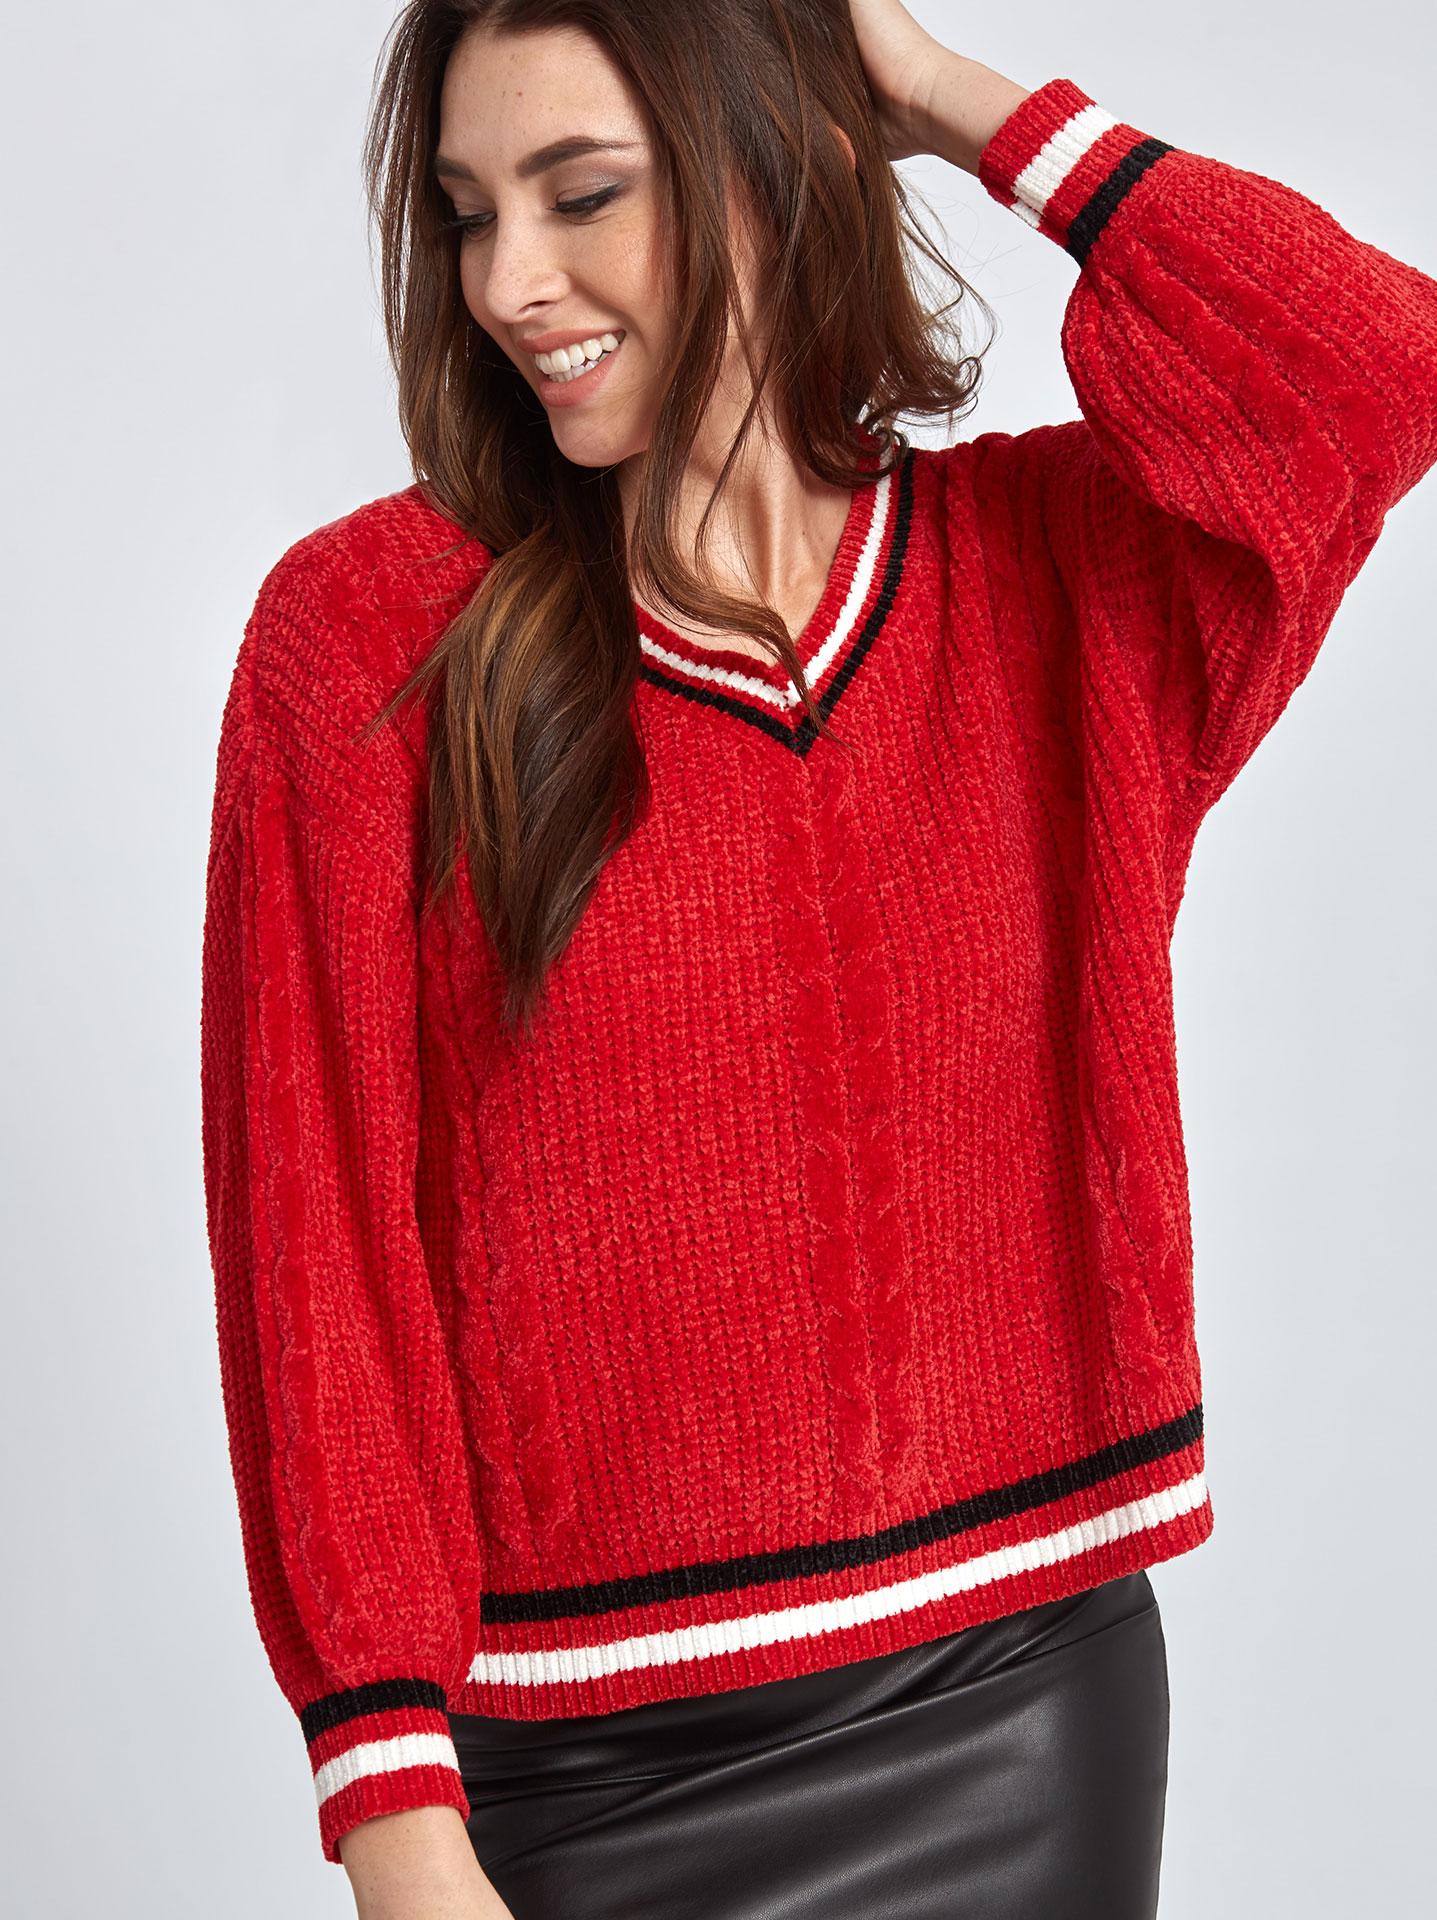 ff91e04a582c Chenille πουλόβερ με ρίγες σε κοκκινο